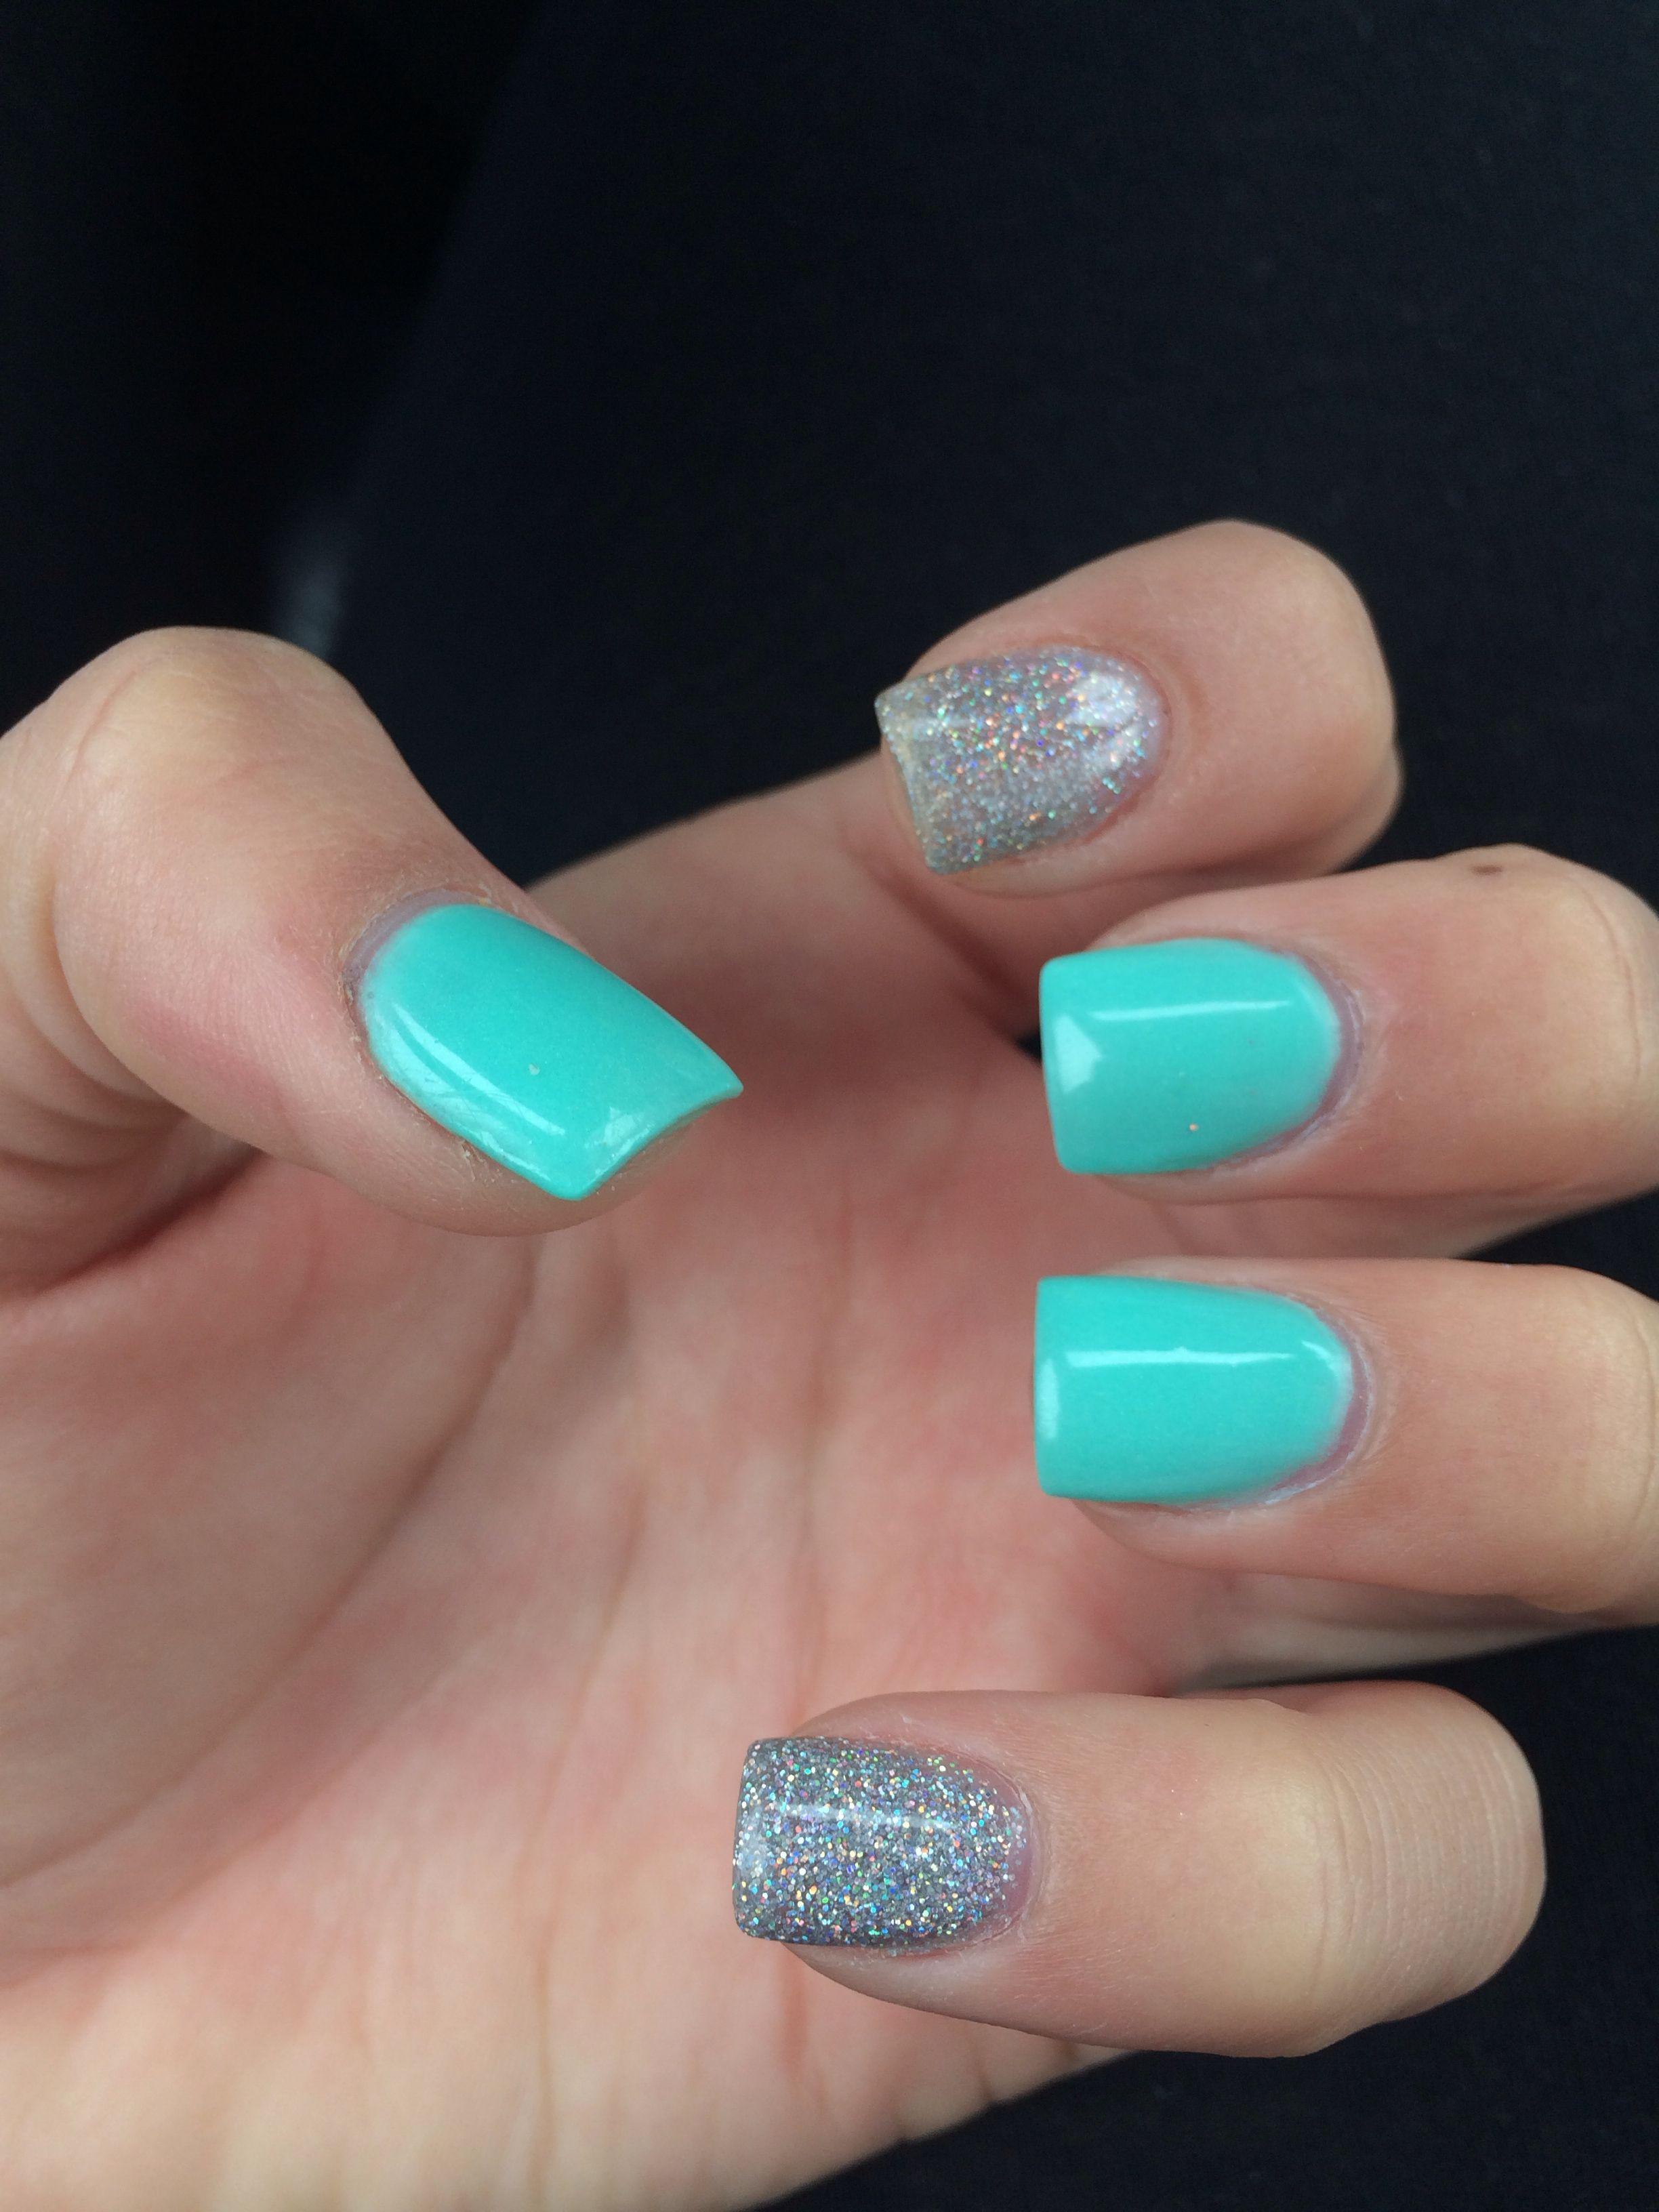 Teal acrylic nails   Acrylic nails   Pinterest   Teal ...